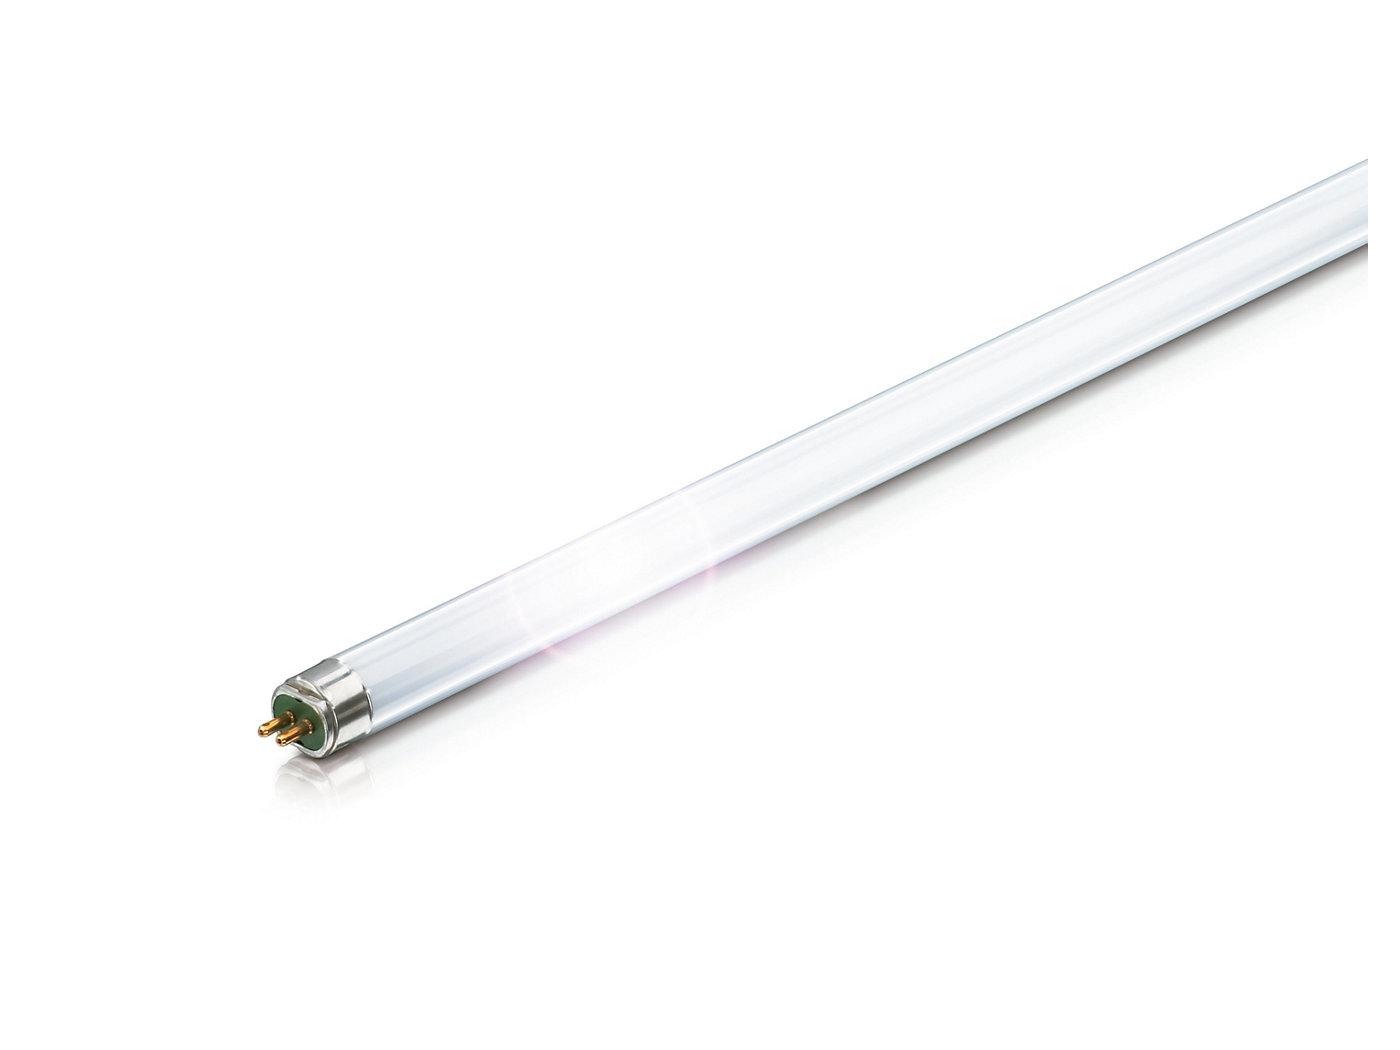 PHILIPS飛利浦 T5 Essential易省節能燈管 (3尺21W) 3000K黃光 T5燈管